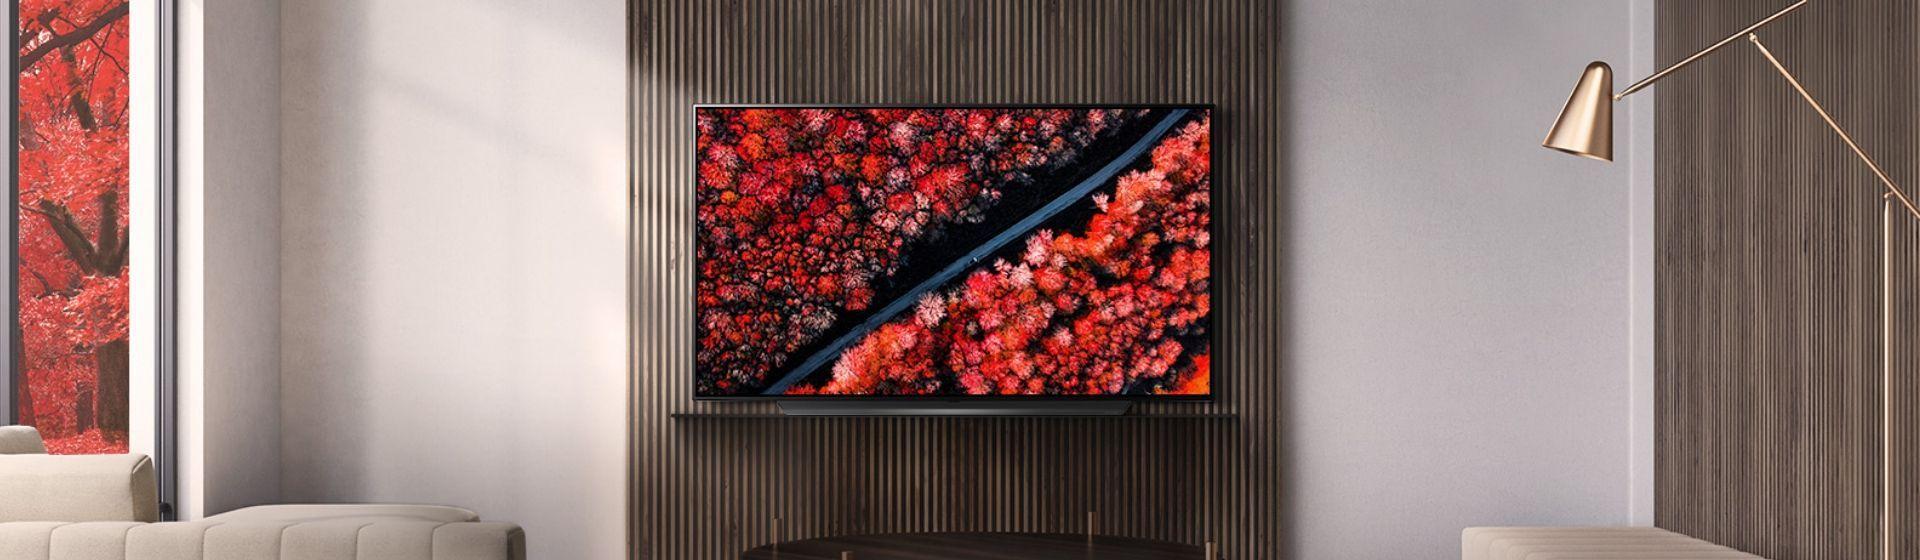 Review LG C9: vale a pena comprar esta smart TV OLED?